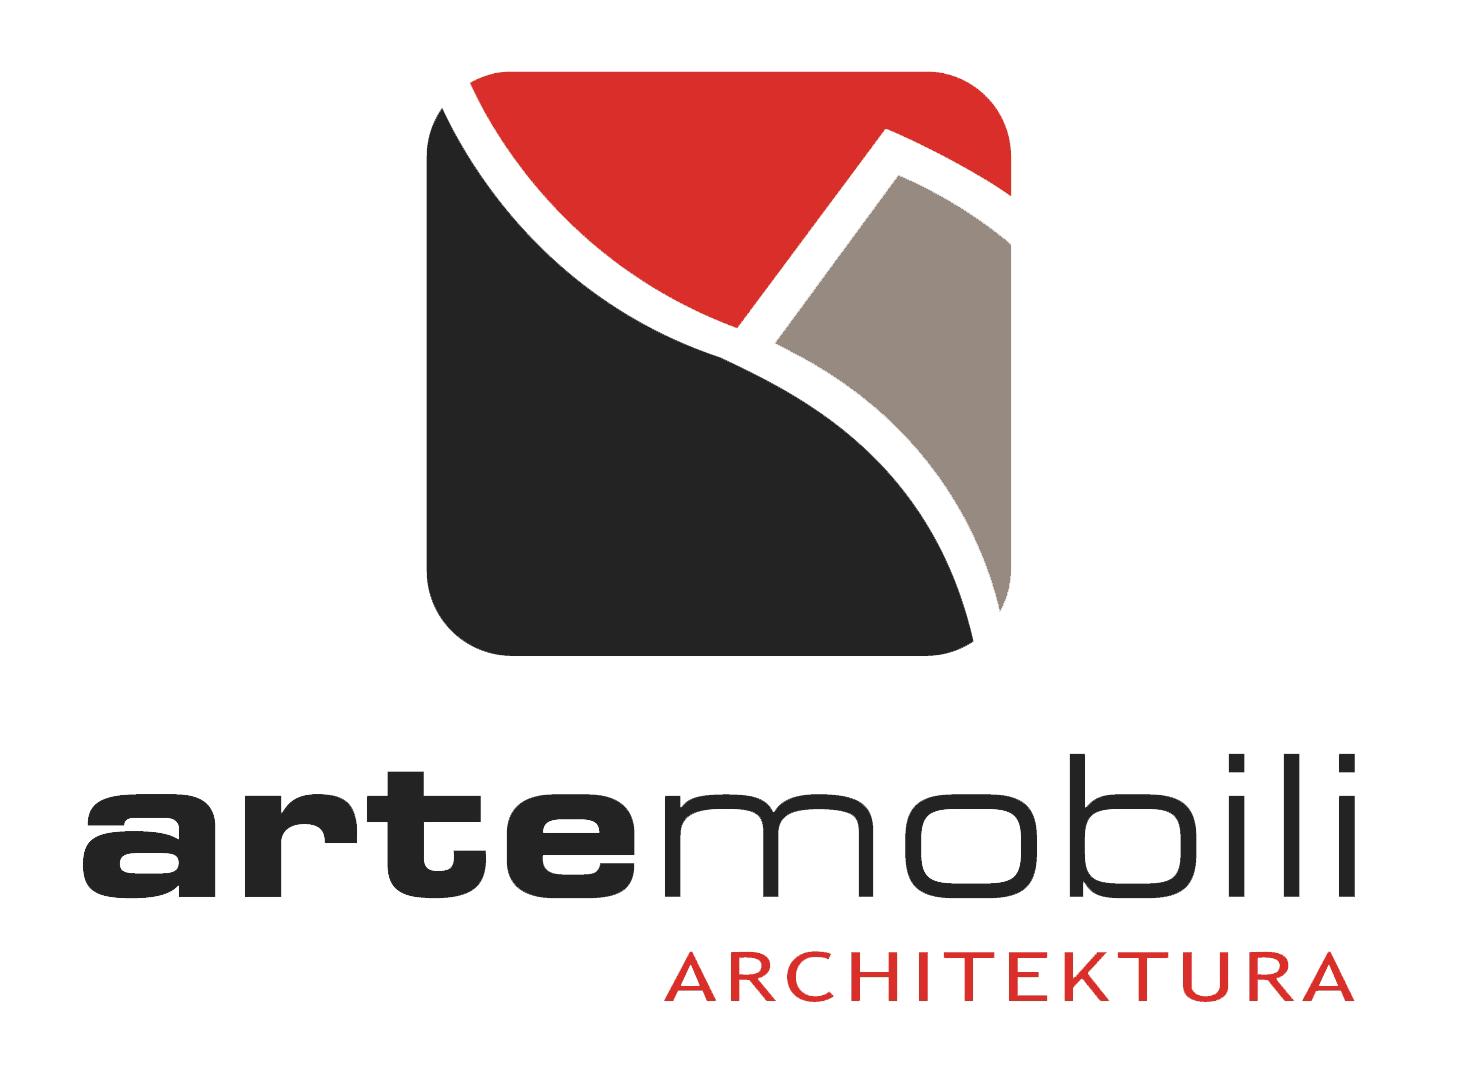 artemobili